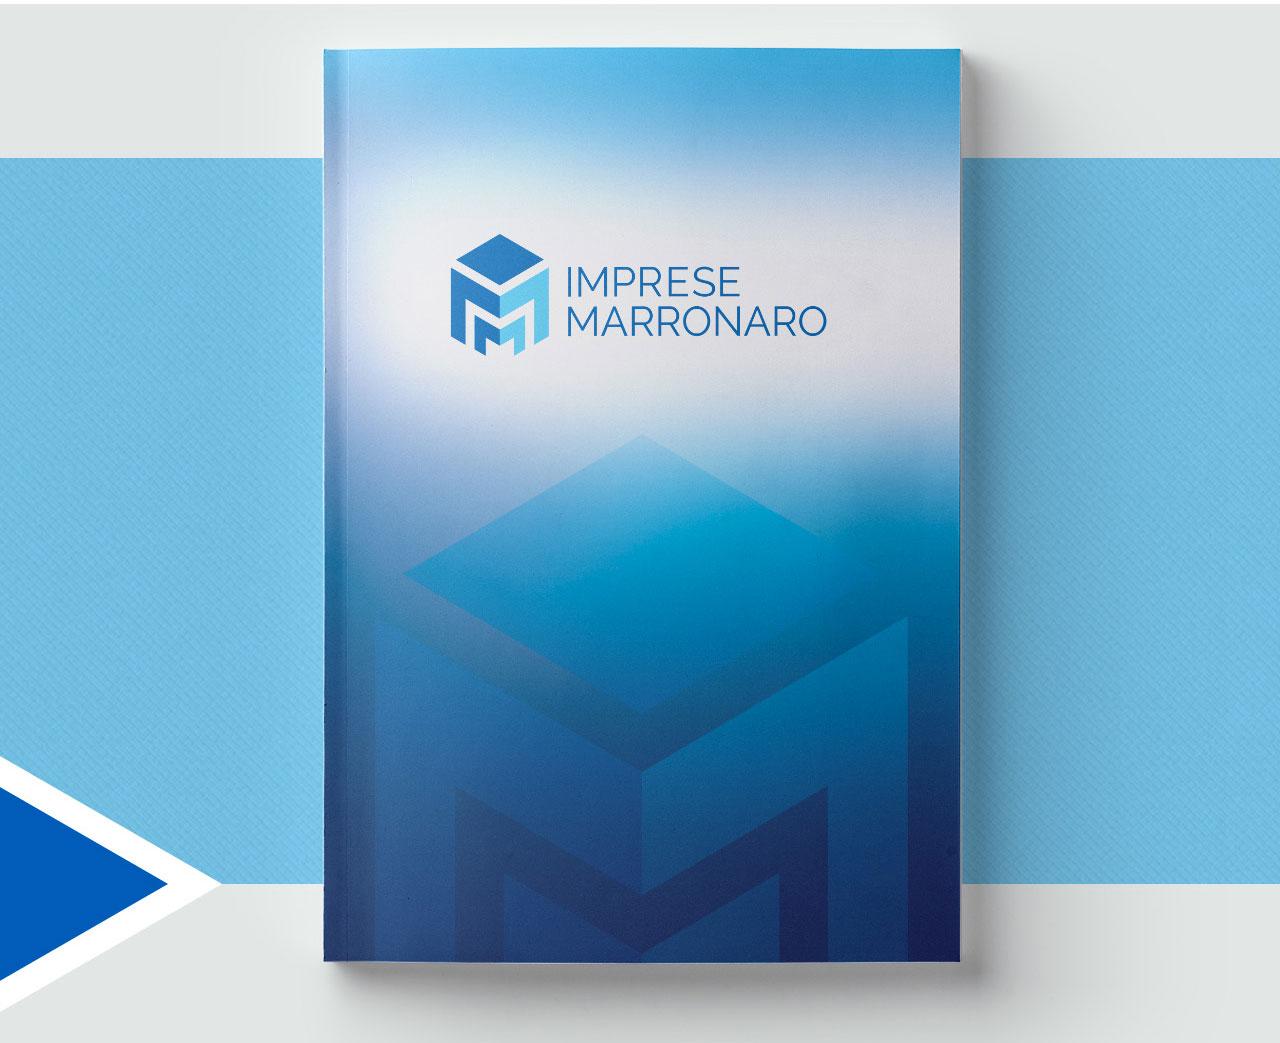 imprese marronaro graphid catalogo copertina